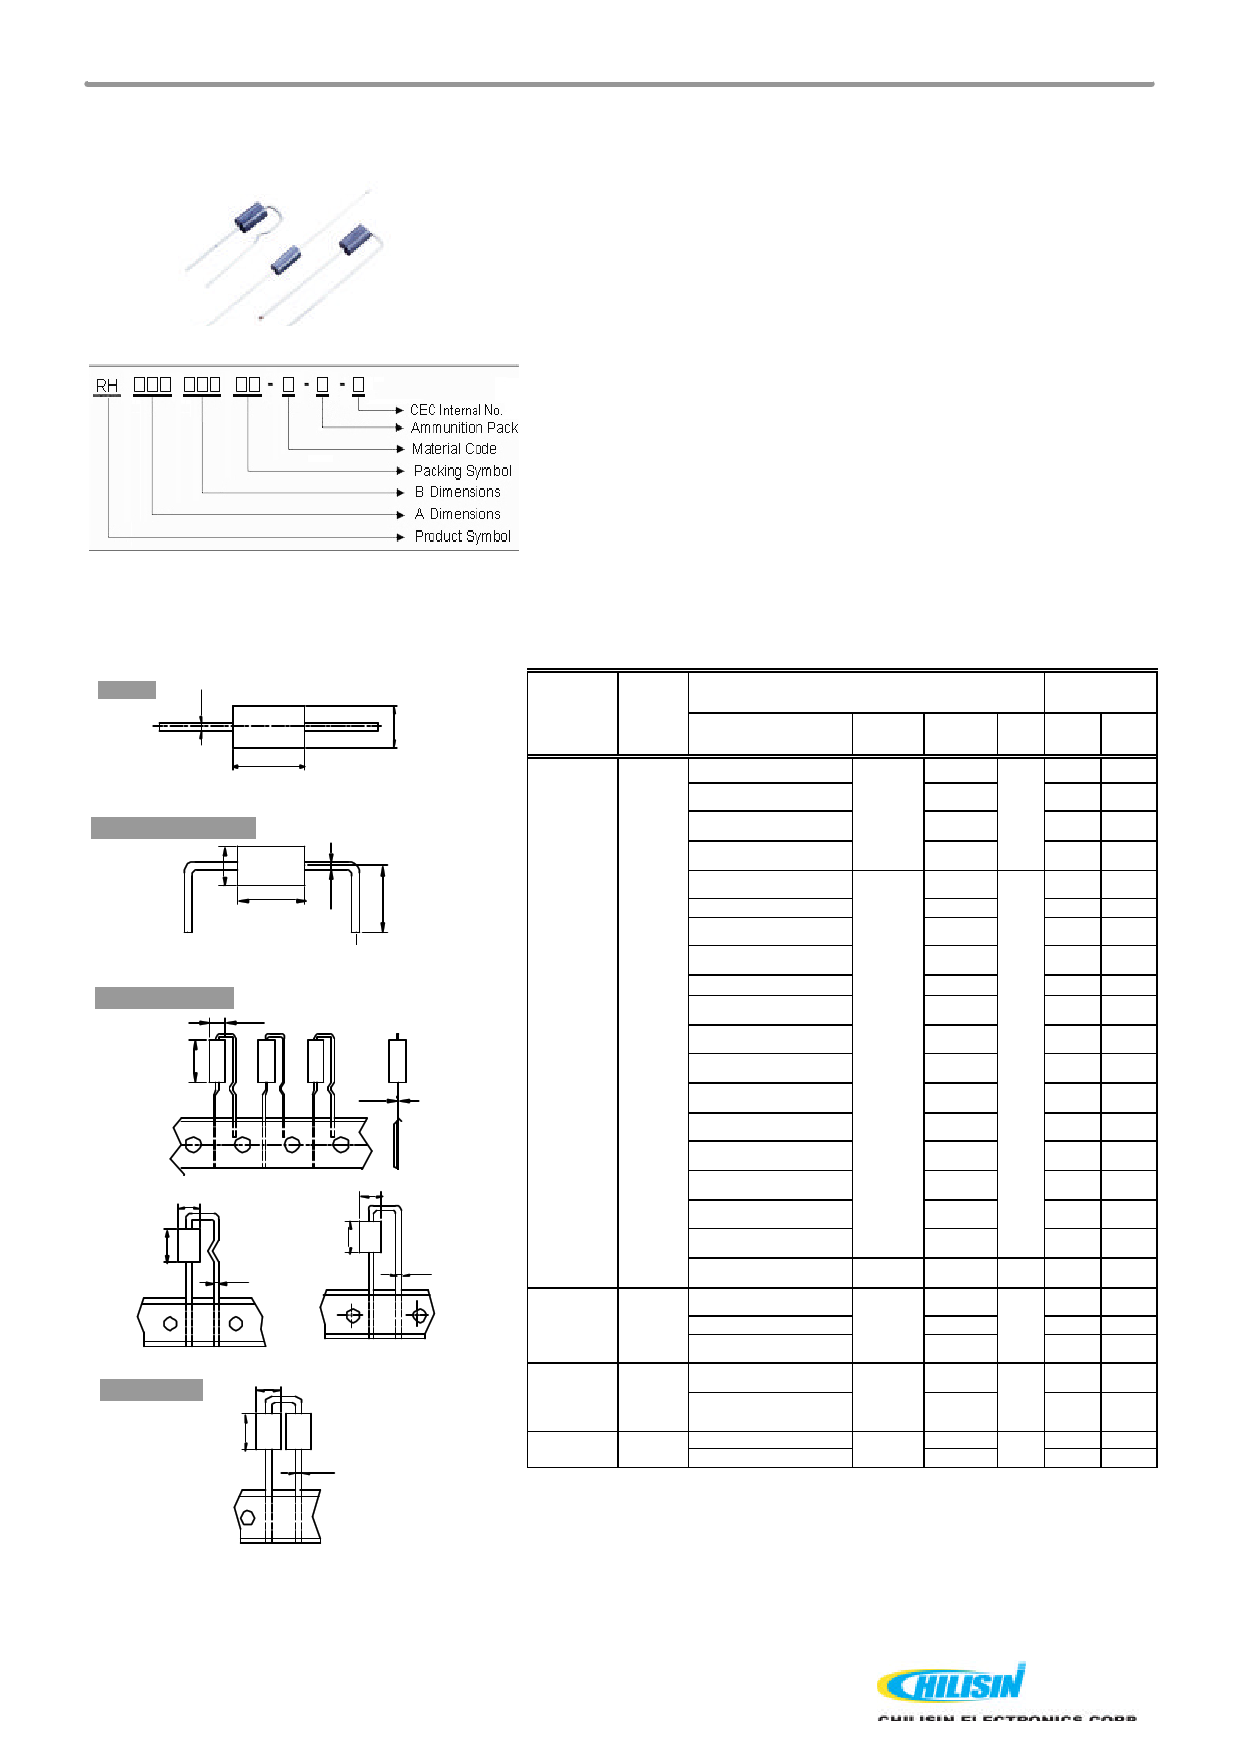 RH03583 데이터시트 및 RH03583 PDF